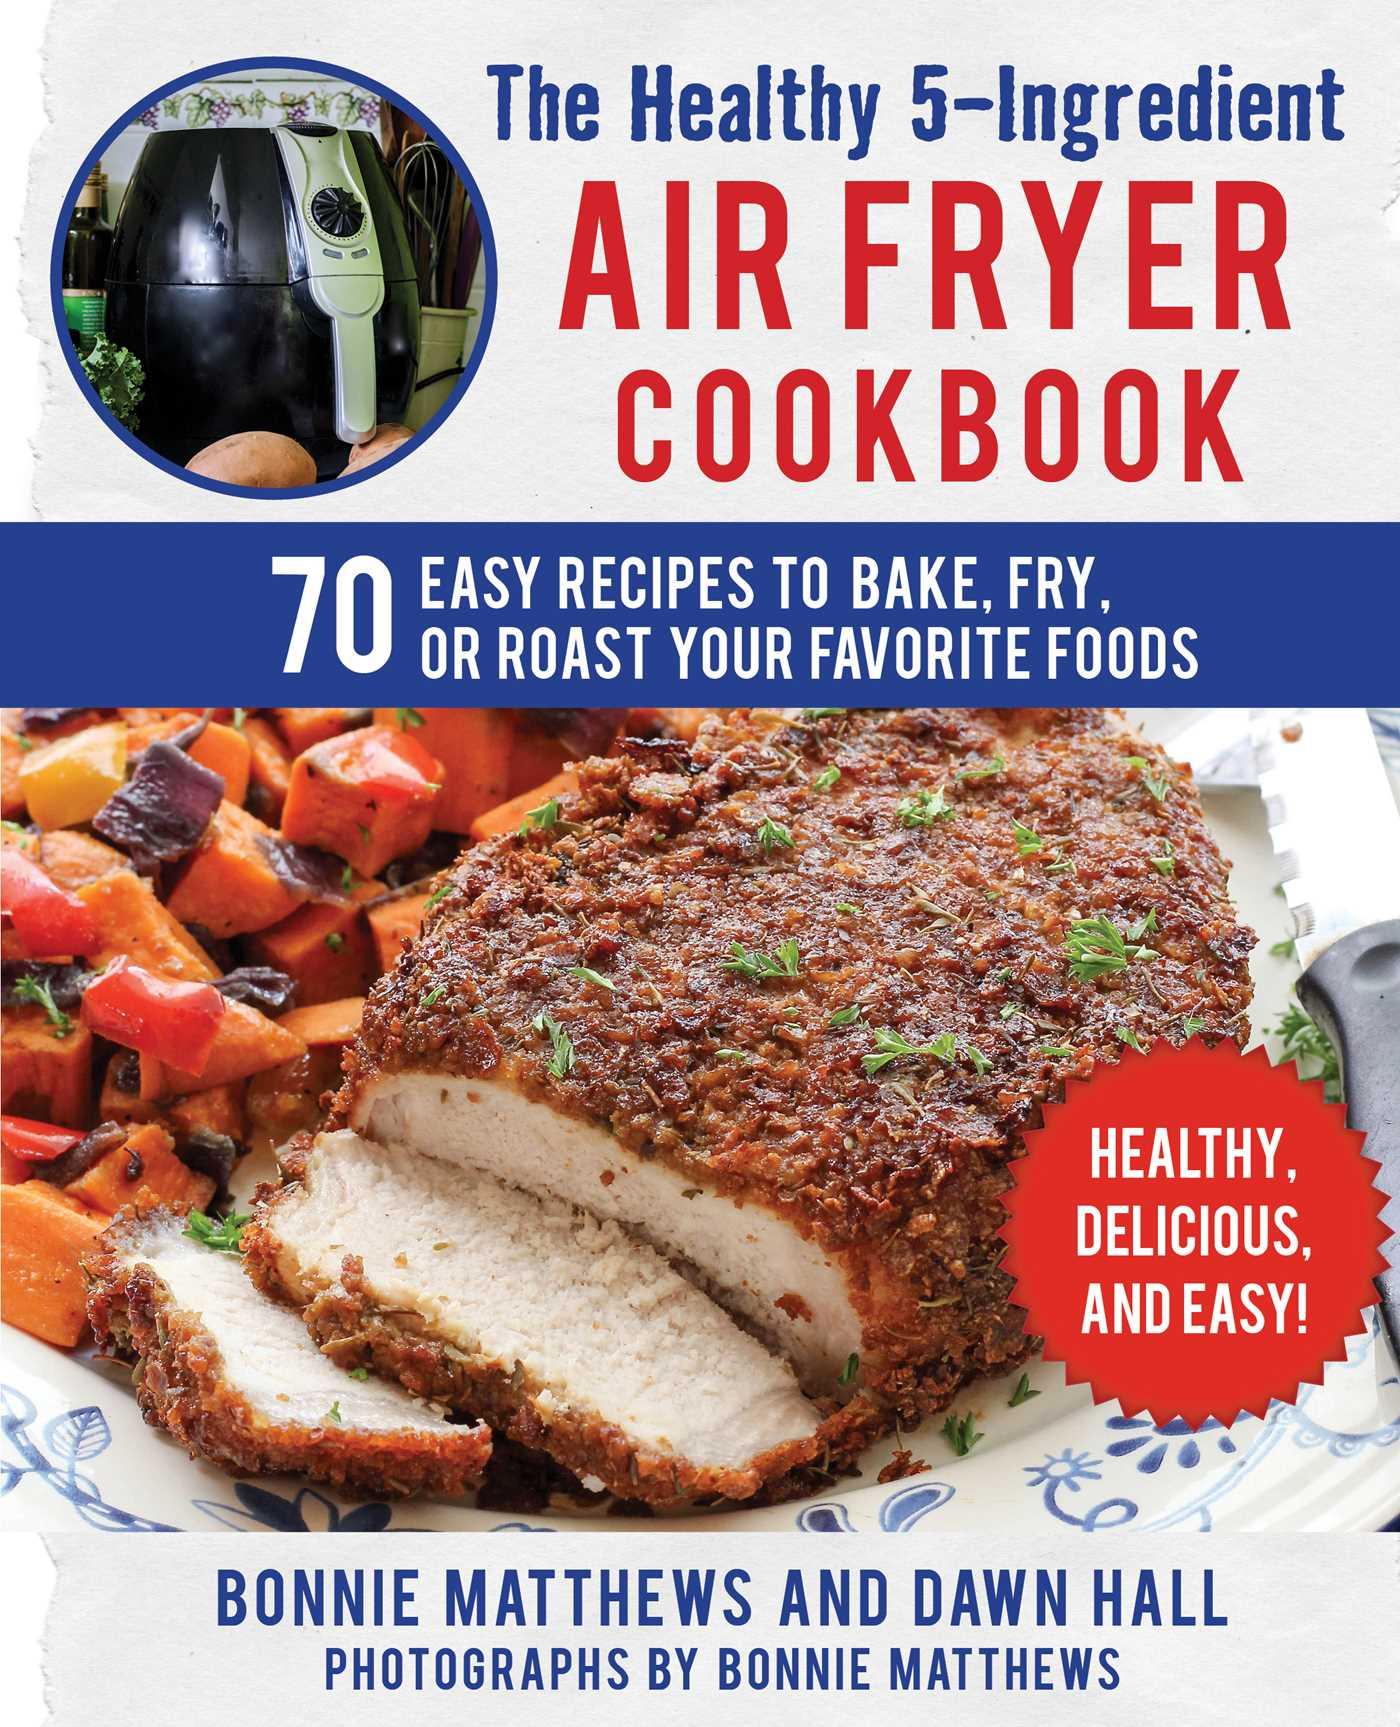 Book Cover Image (jpg): The Healthy 5-Ingredient Air Fryer Cookbook